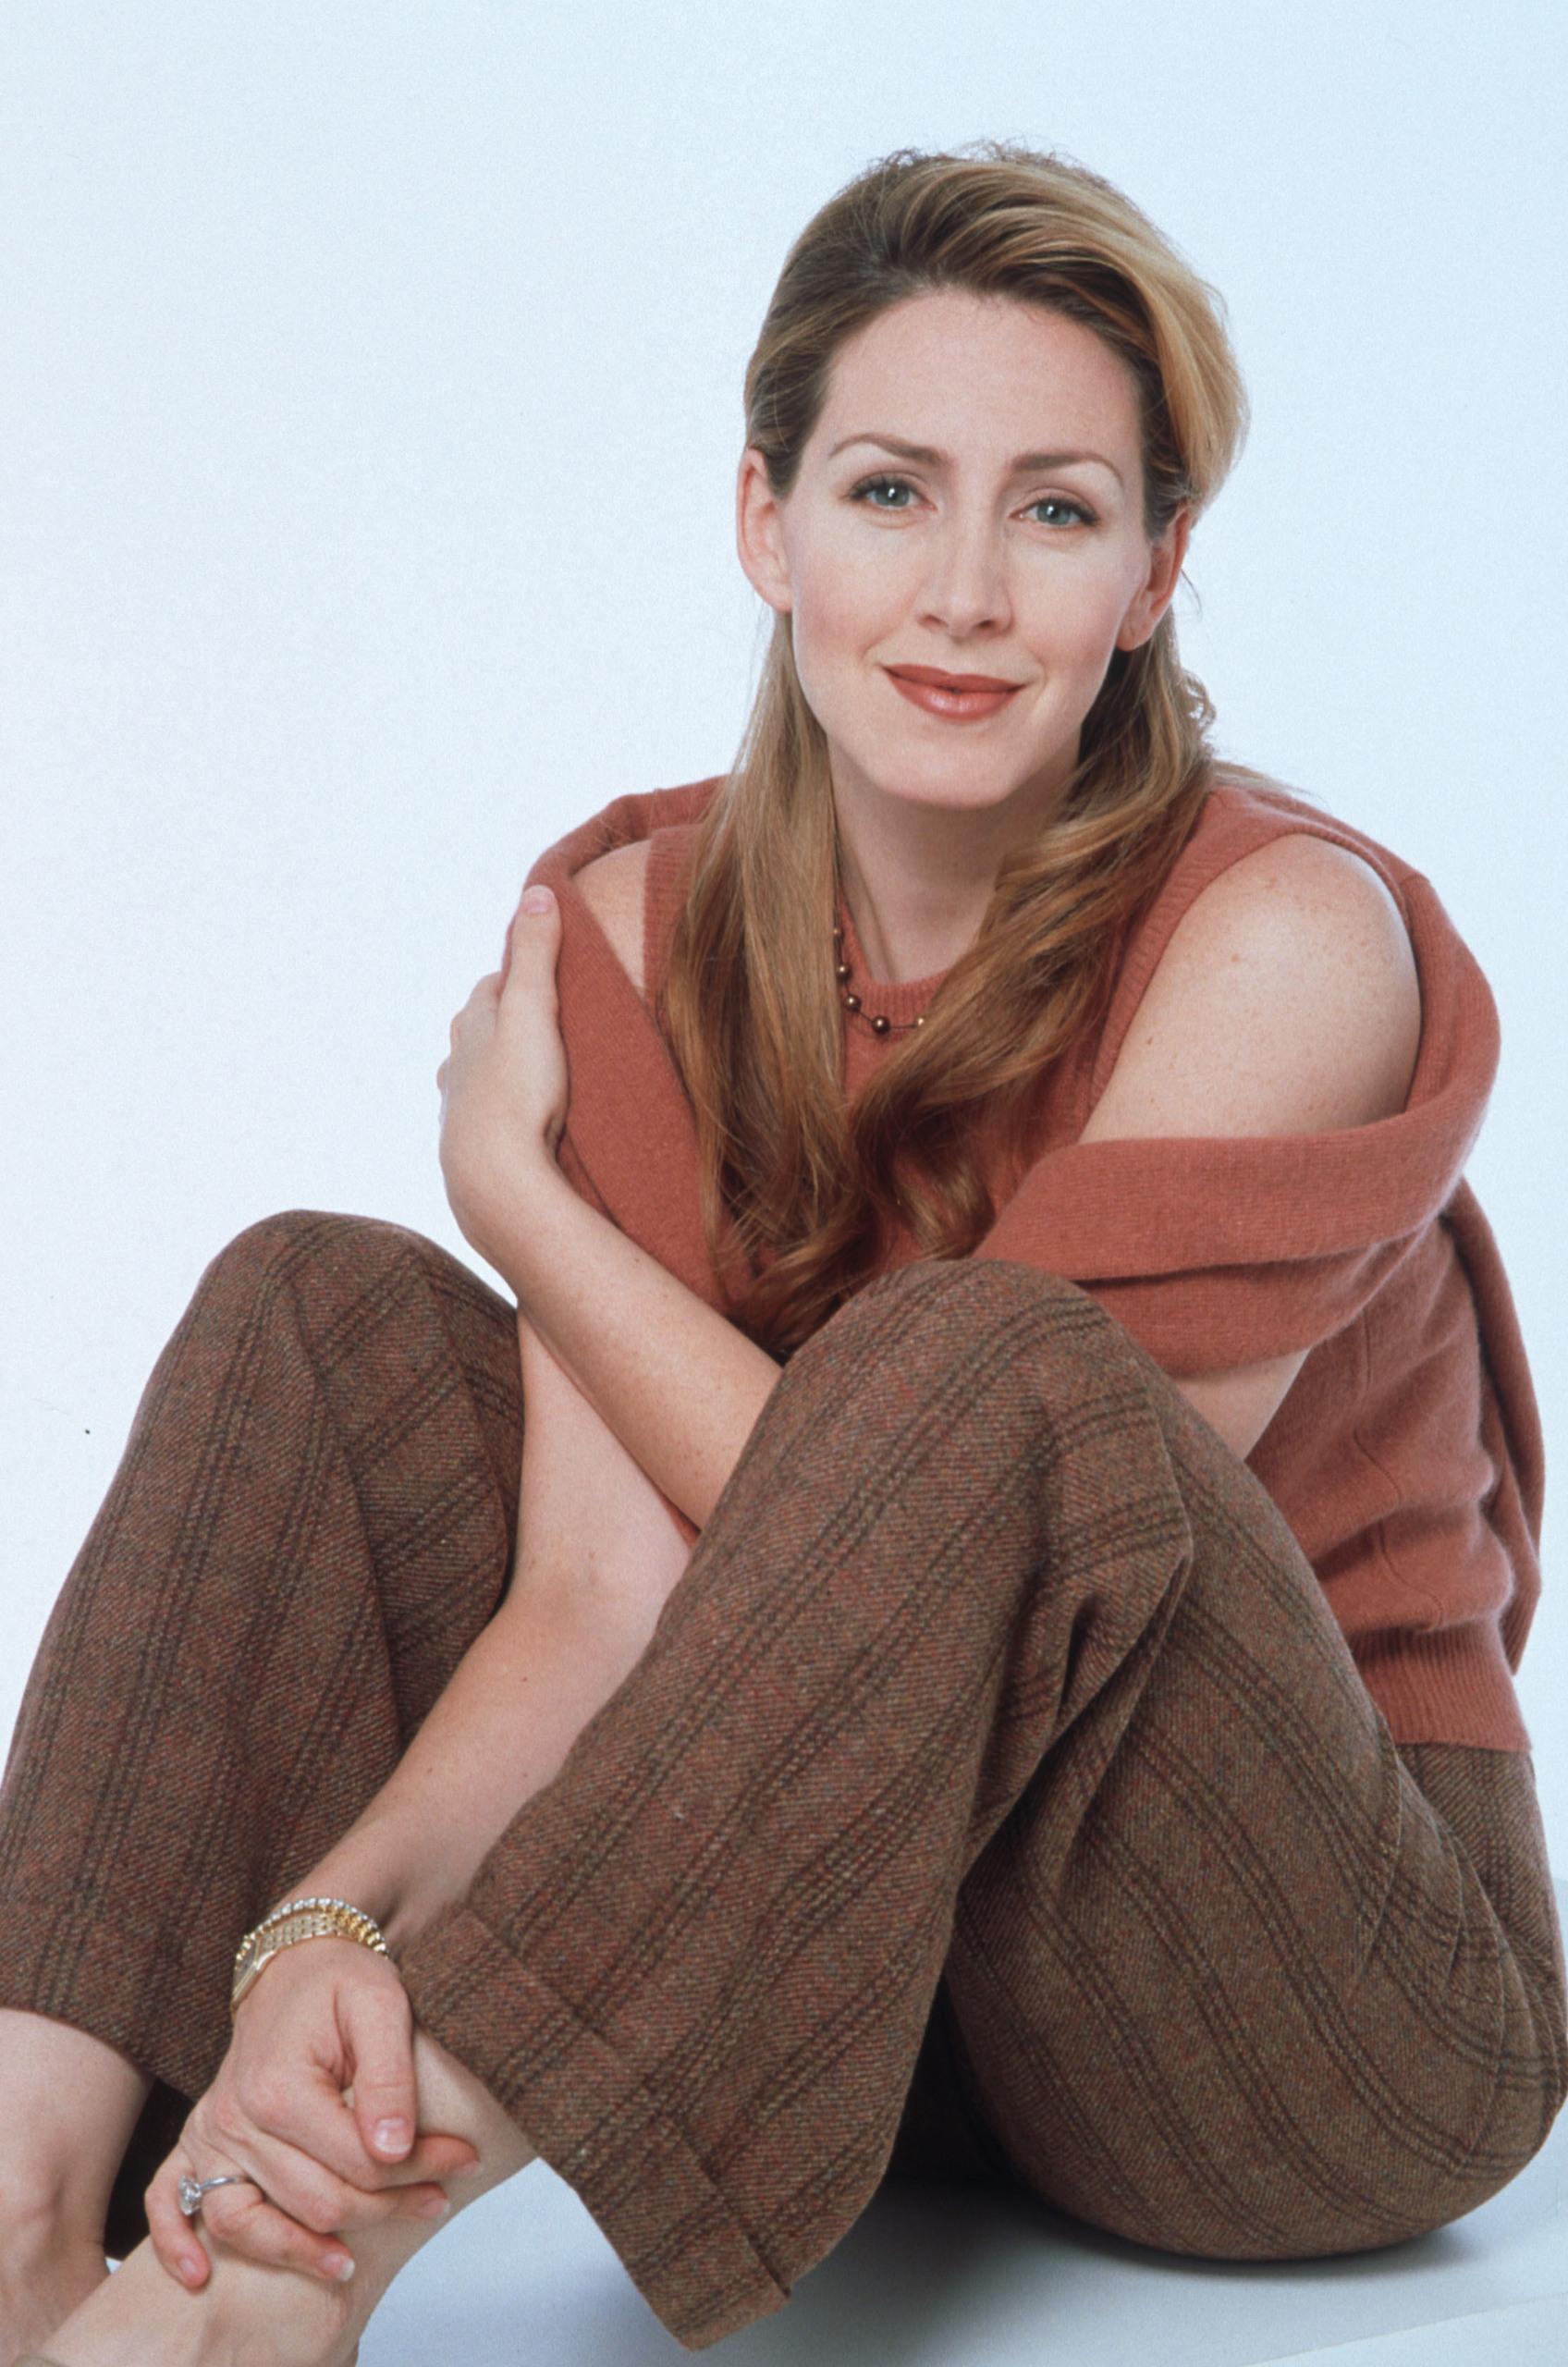 Kristal Marshall,Tommy Flanagan (born 1965) XXX videos Vittoria Belvedere (born 1972),Brooke Elliott